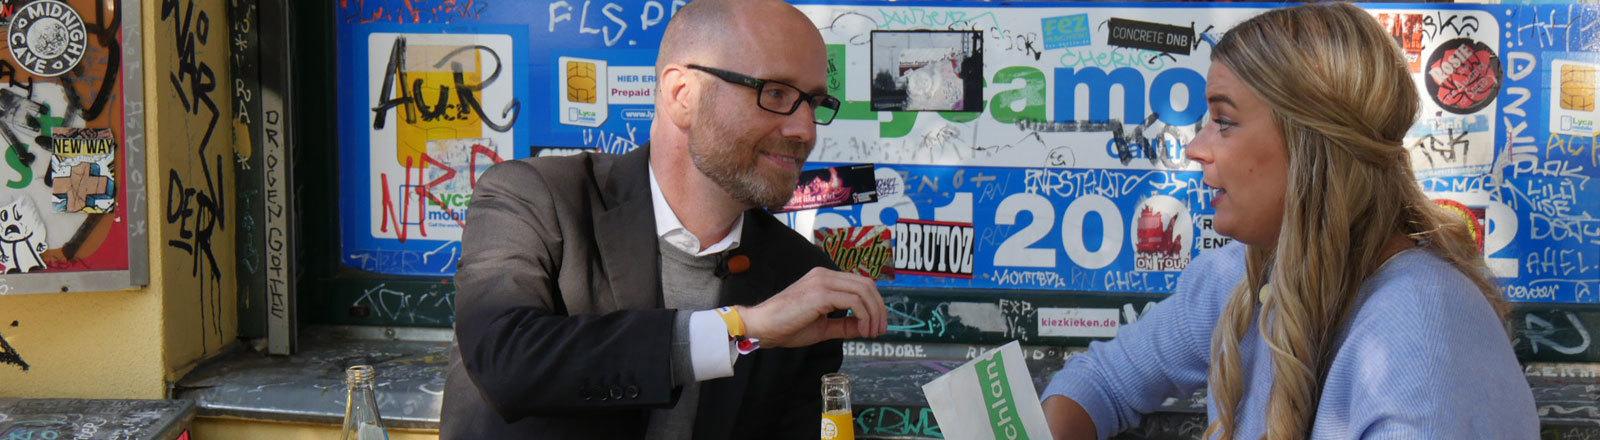 Peter Tauber CDU